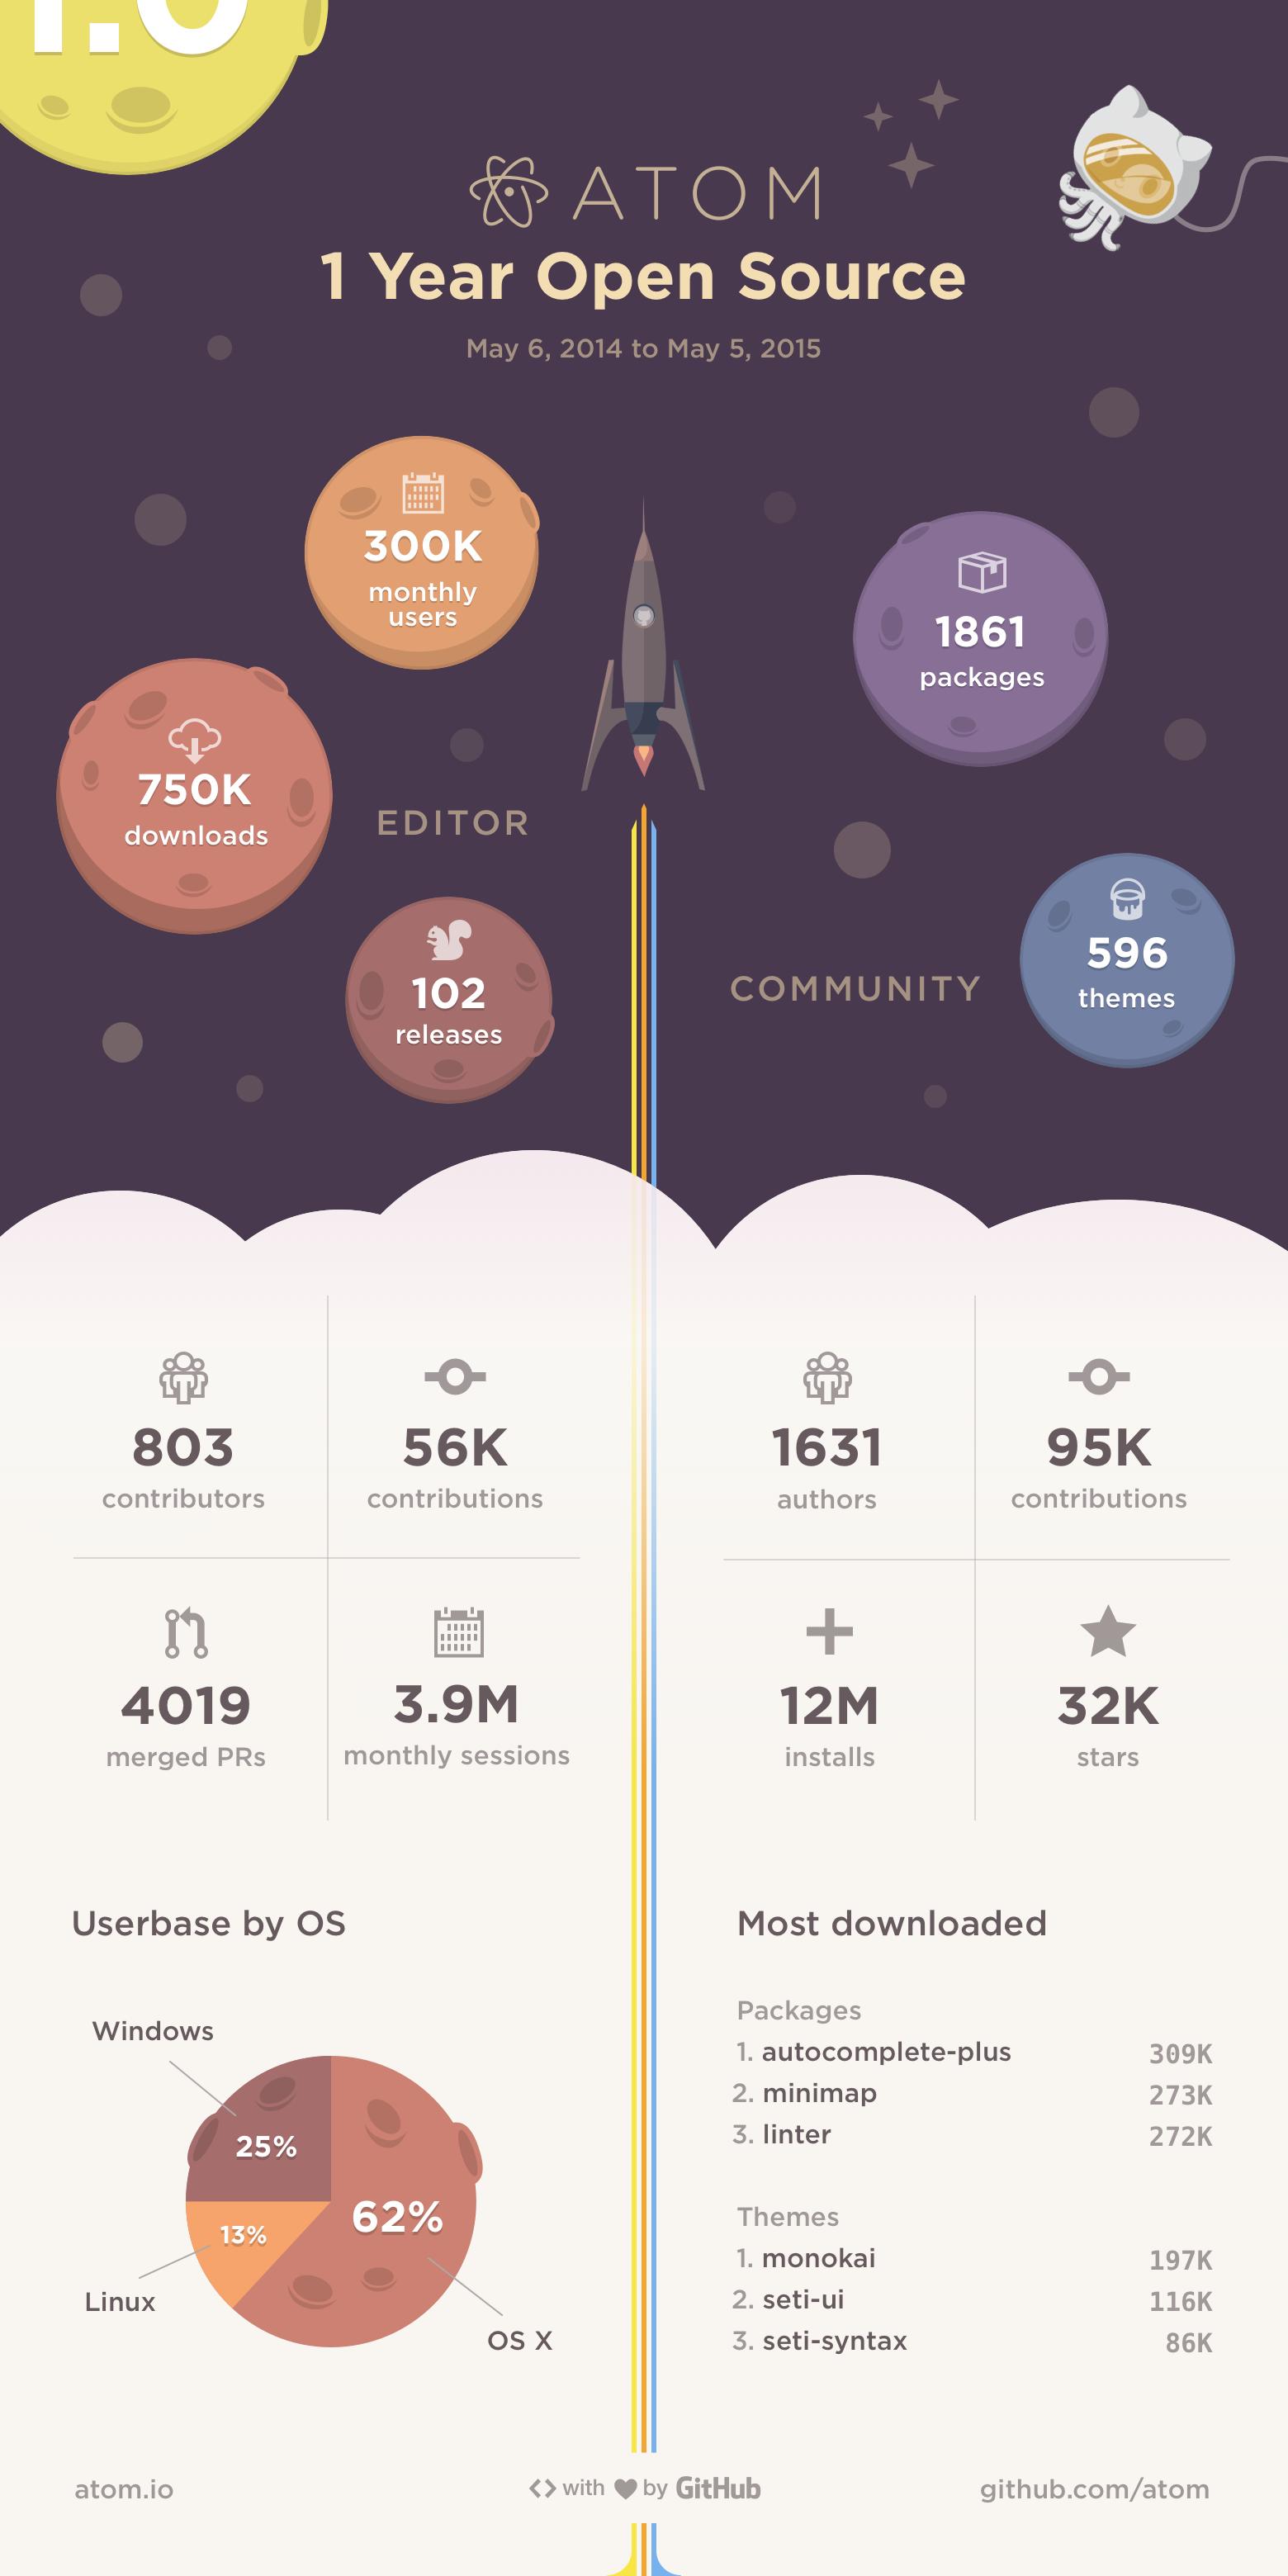 07075801 vBgL Github Atom 开源一周年 超过 800 名贡献者参与